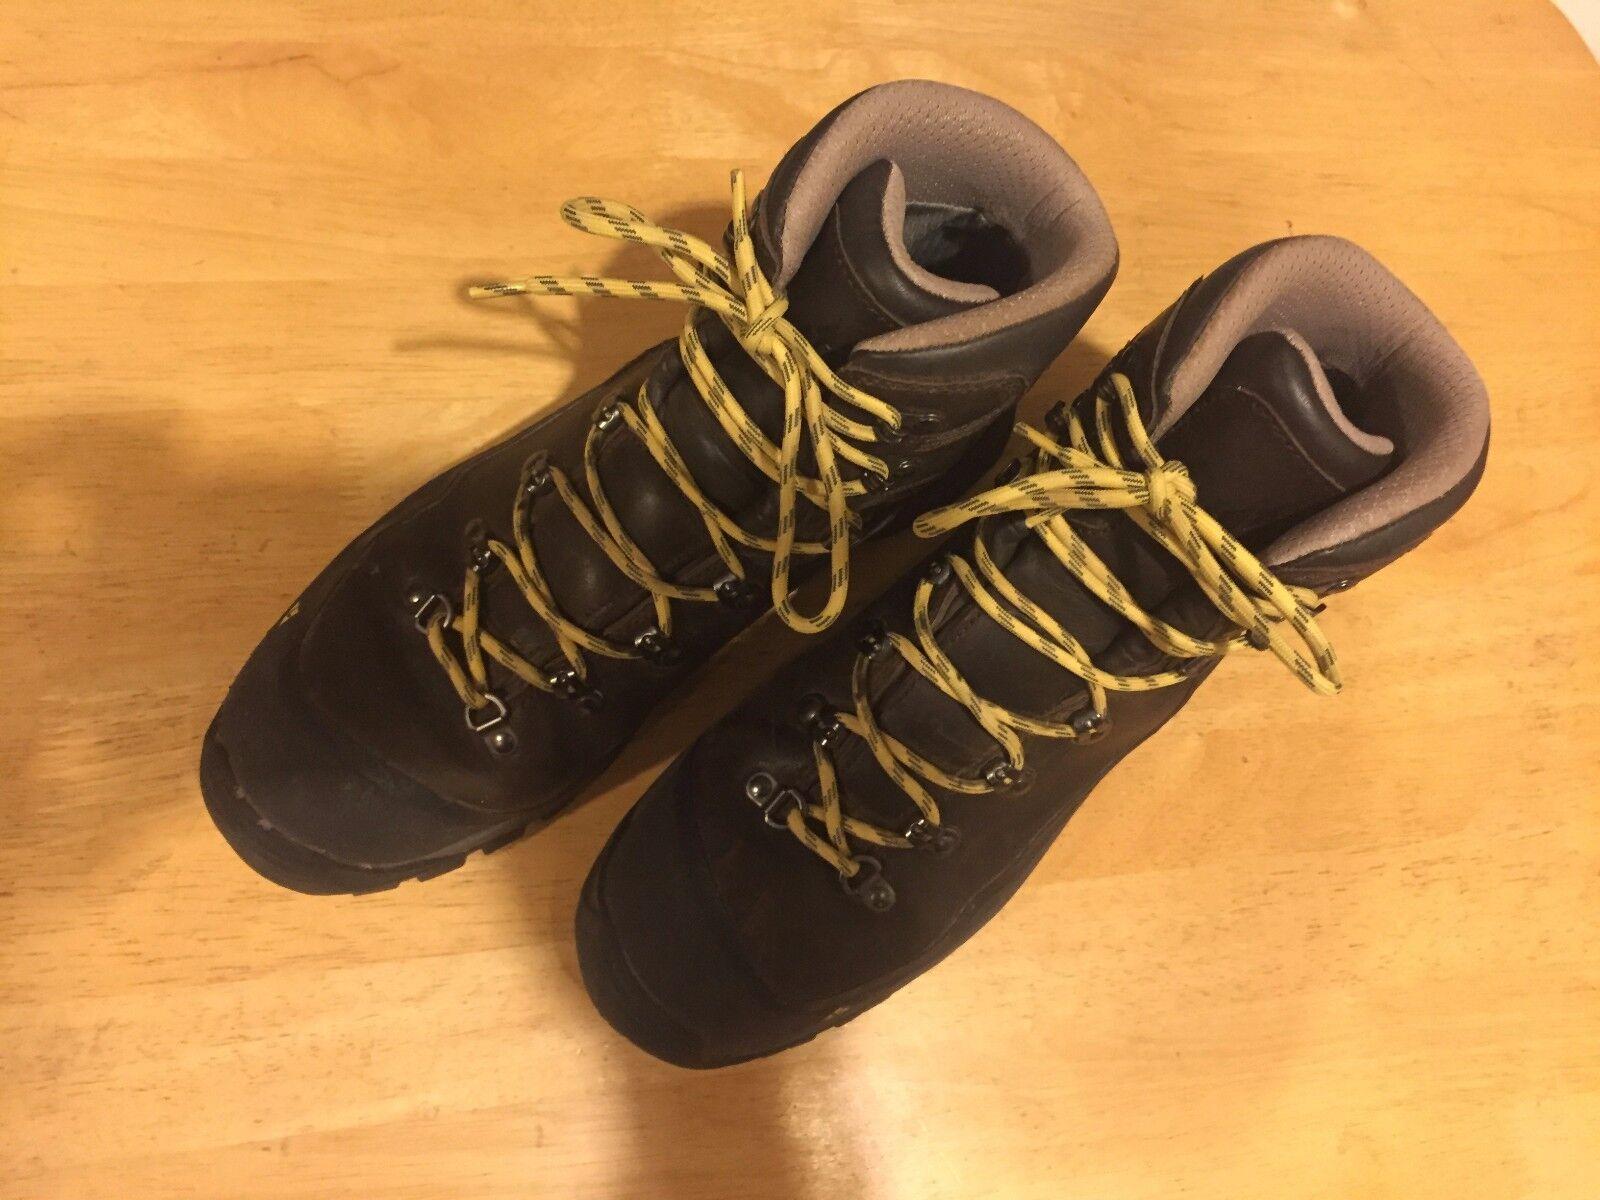 Vasque Eriksson GTX Men's Boot  US 11.5